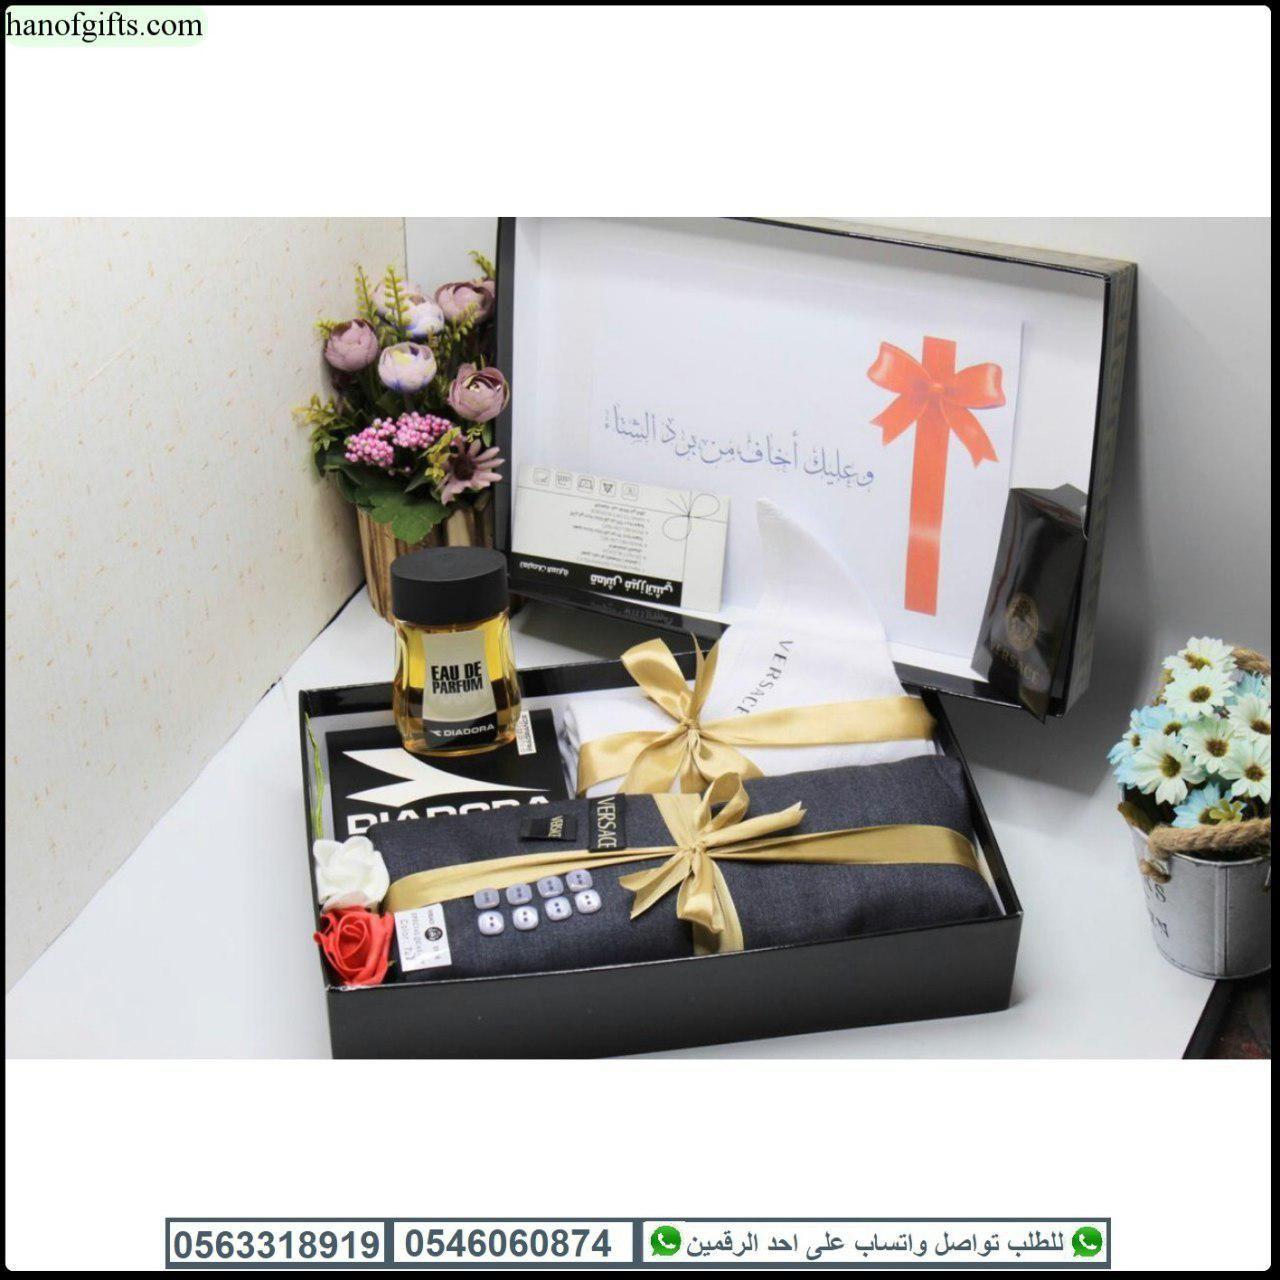 قماش فرزاتشي رجالي Versace مع شماغ ابيض فرزاتشي و عطر دادورا هدايا هنوف Gift Wrapping Gifts Wrap